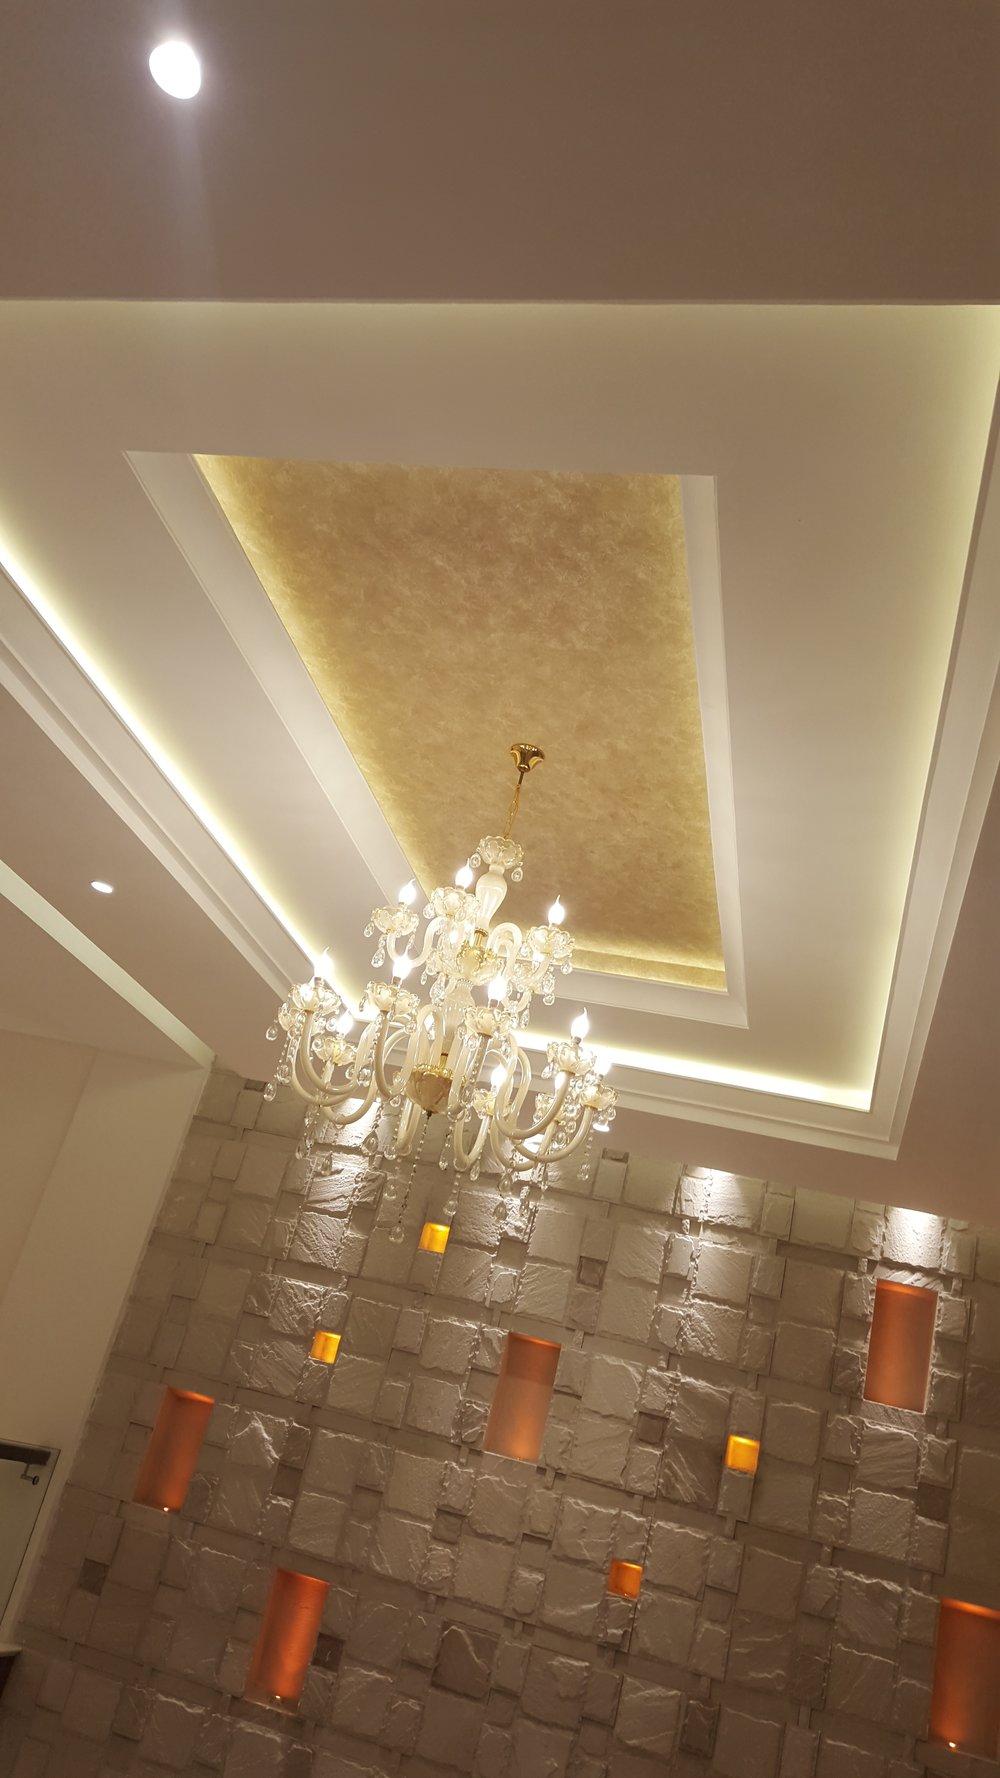 hallway ceiling.jpg